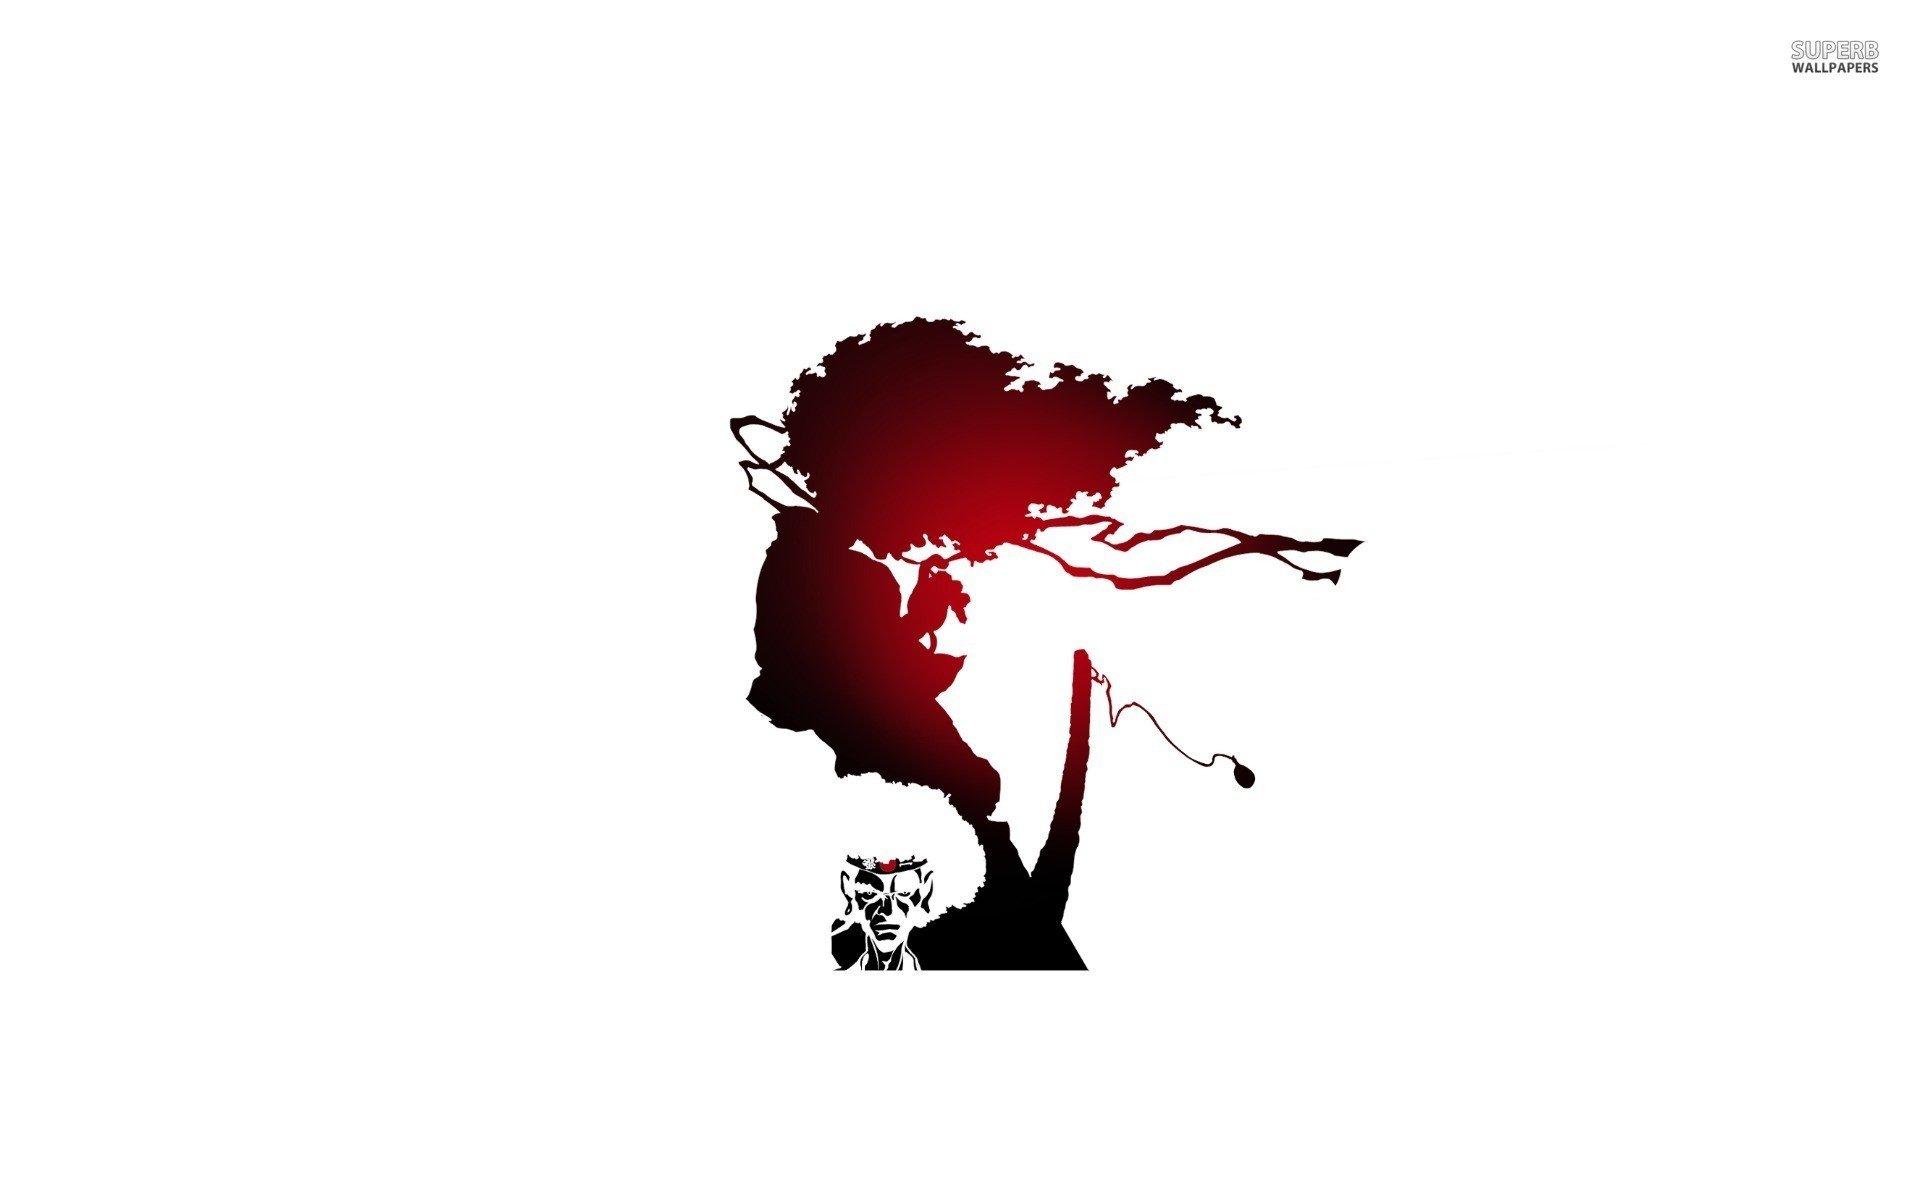 Afro Samurai, Anime Wallpaper